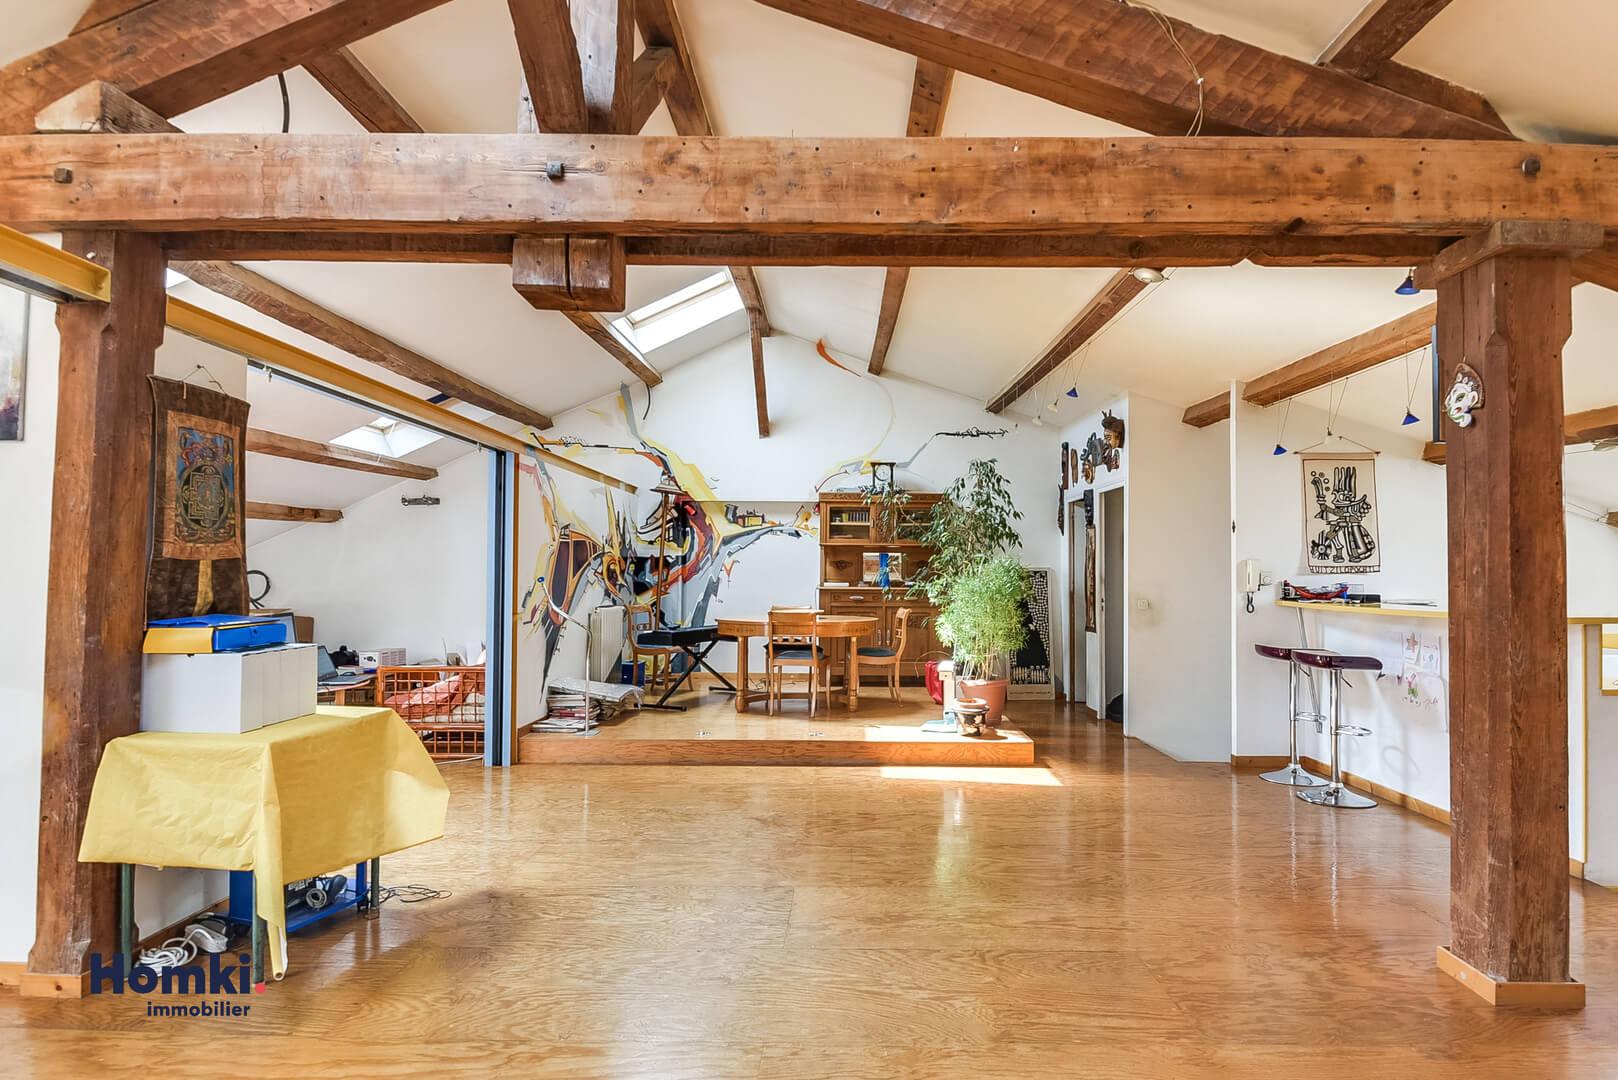 Vente loft Marseille T3 13013 130m²_6